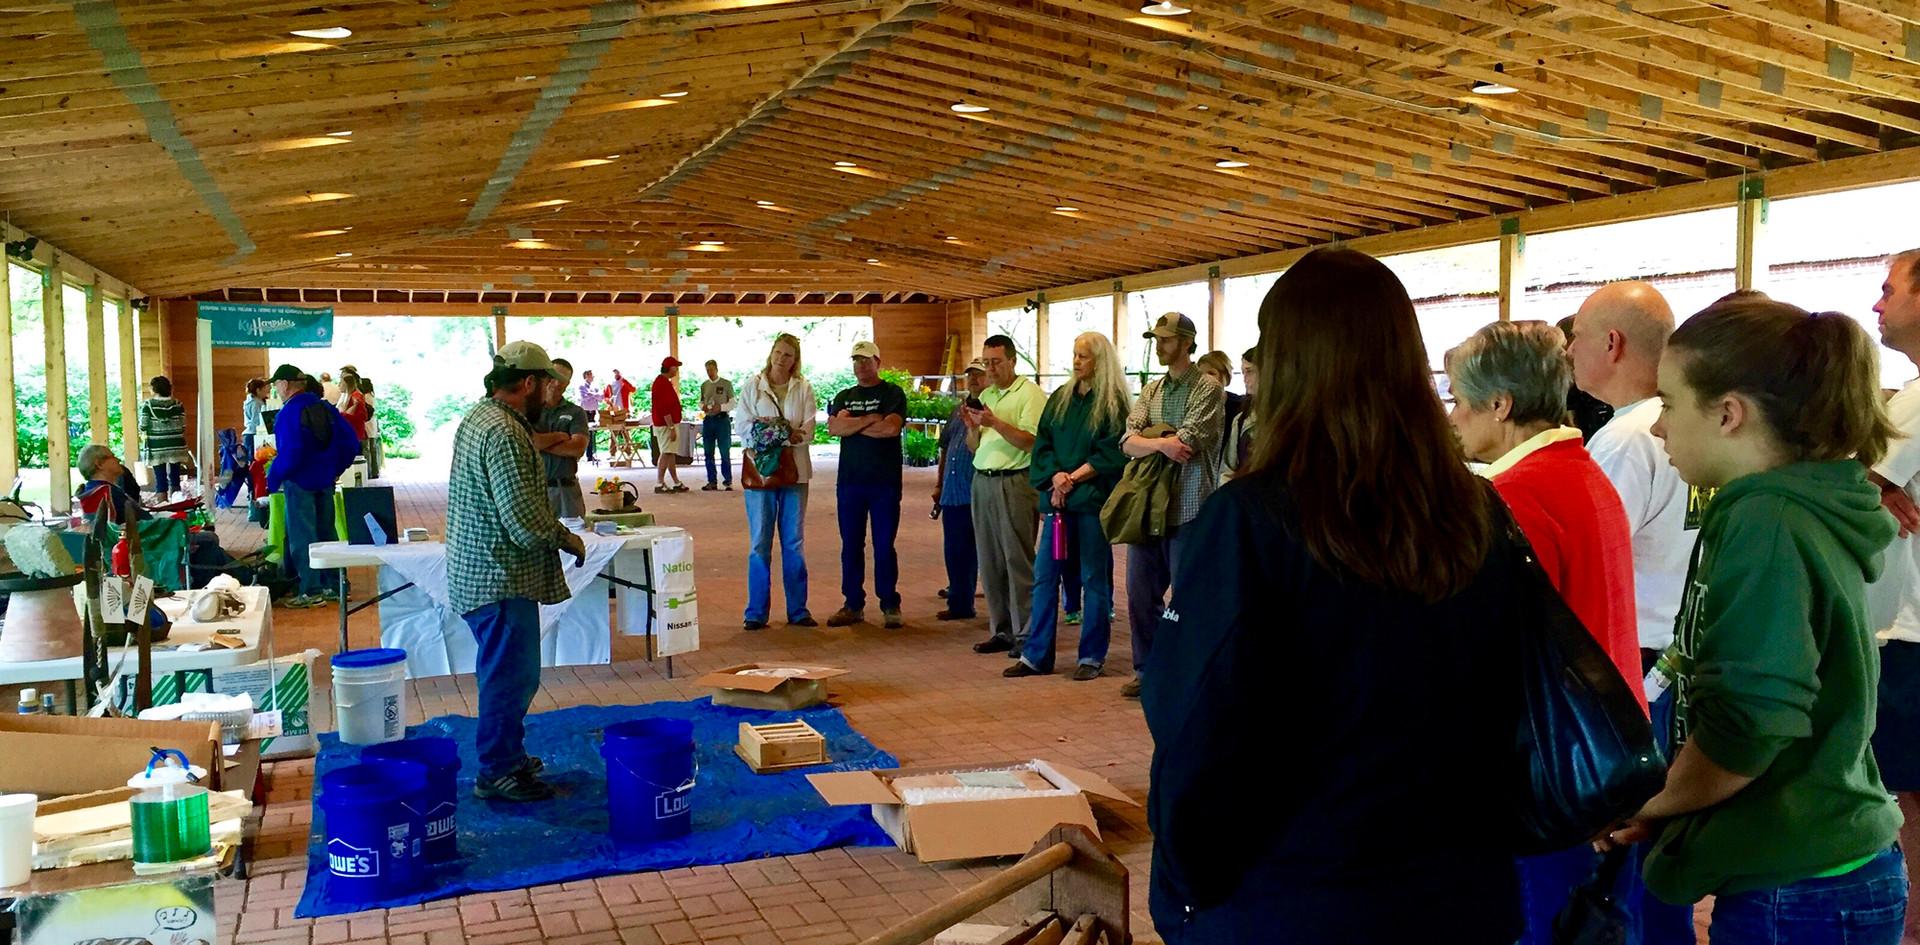 Farmington Historic Plantation in Louisville celebrates the return of hemp with Hemp Discovery Day.